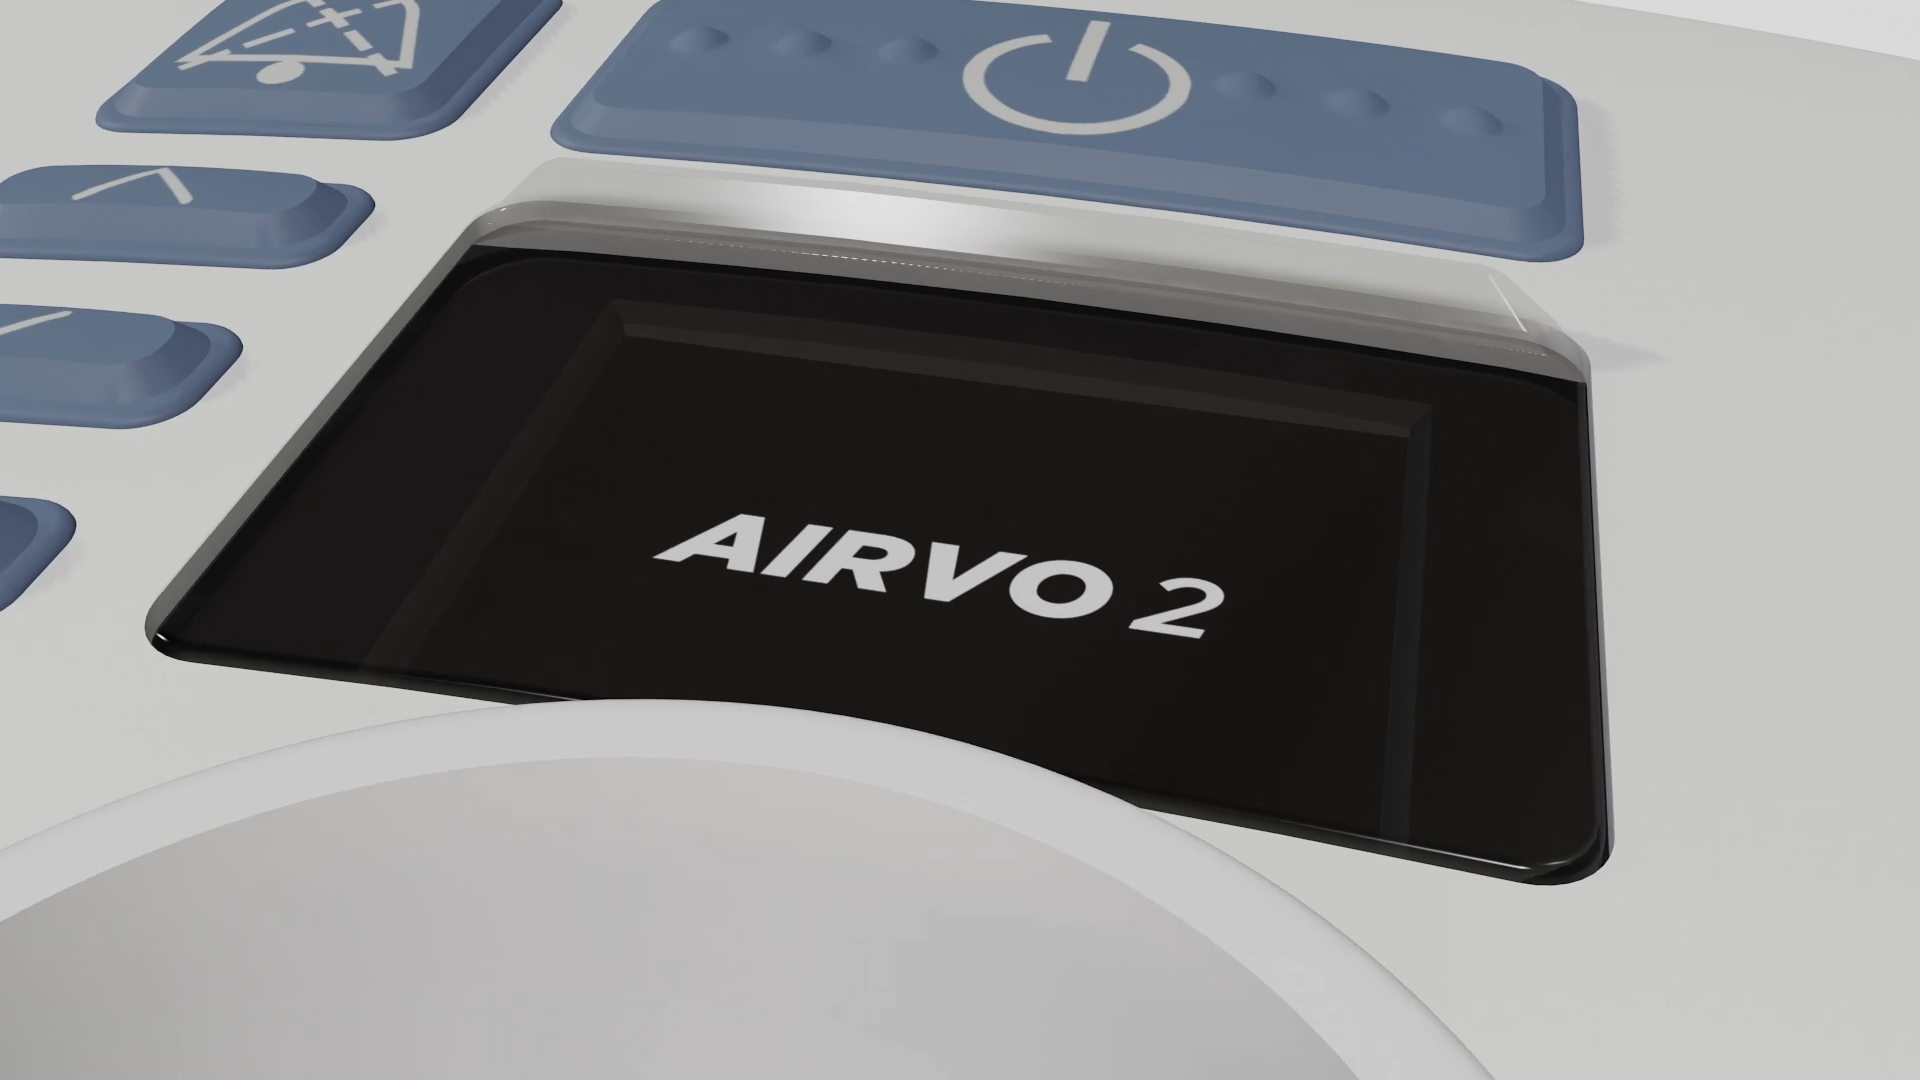 Introducing Airvo 2